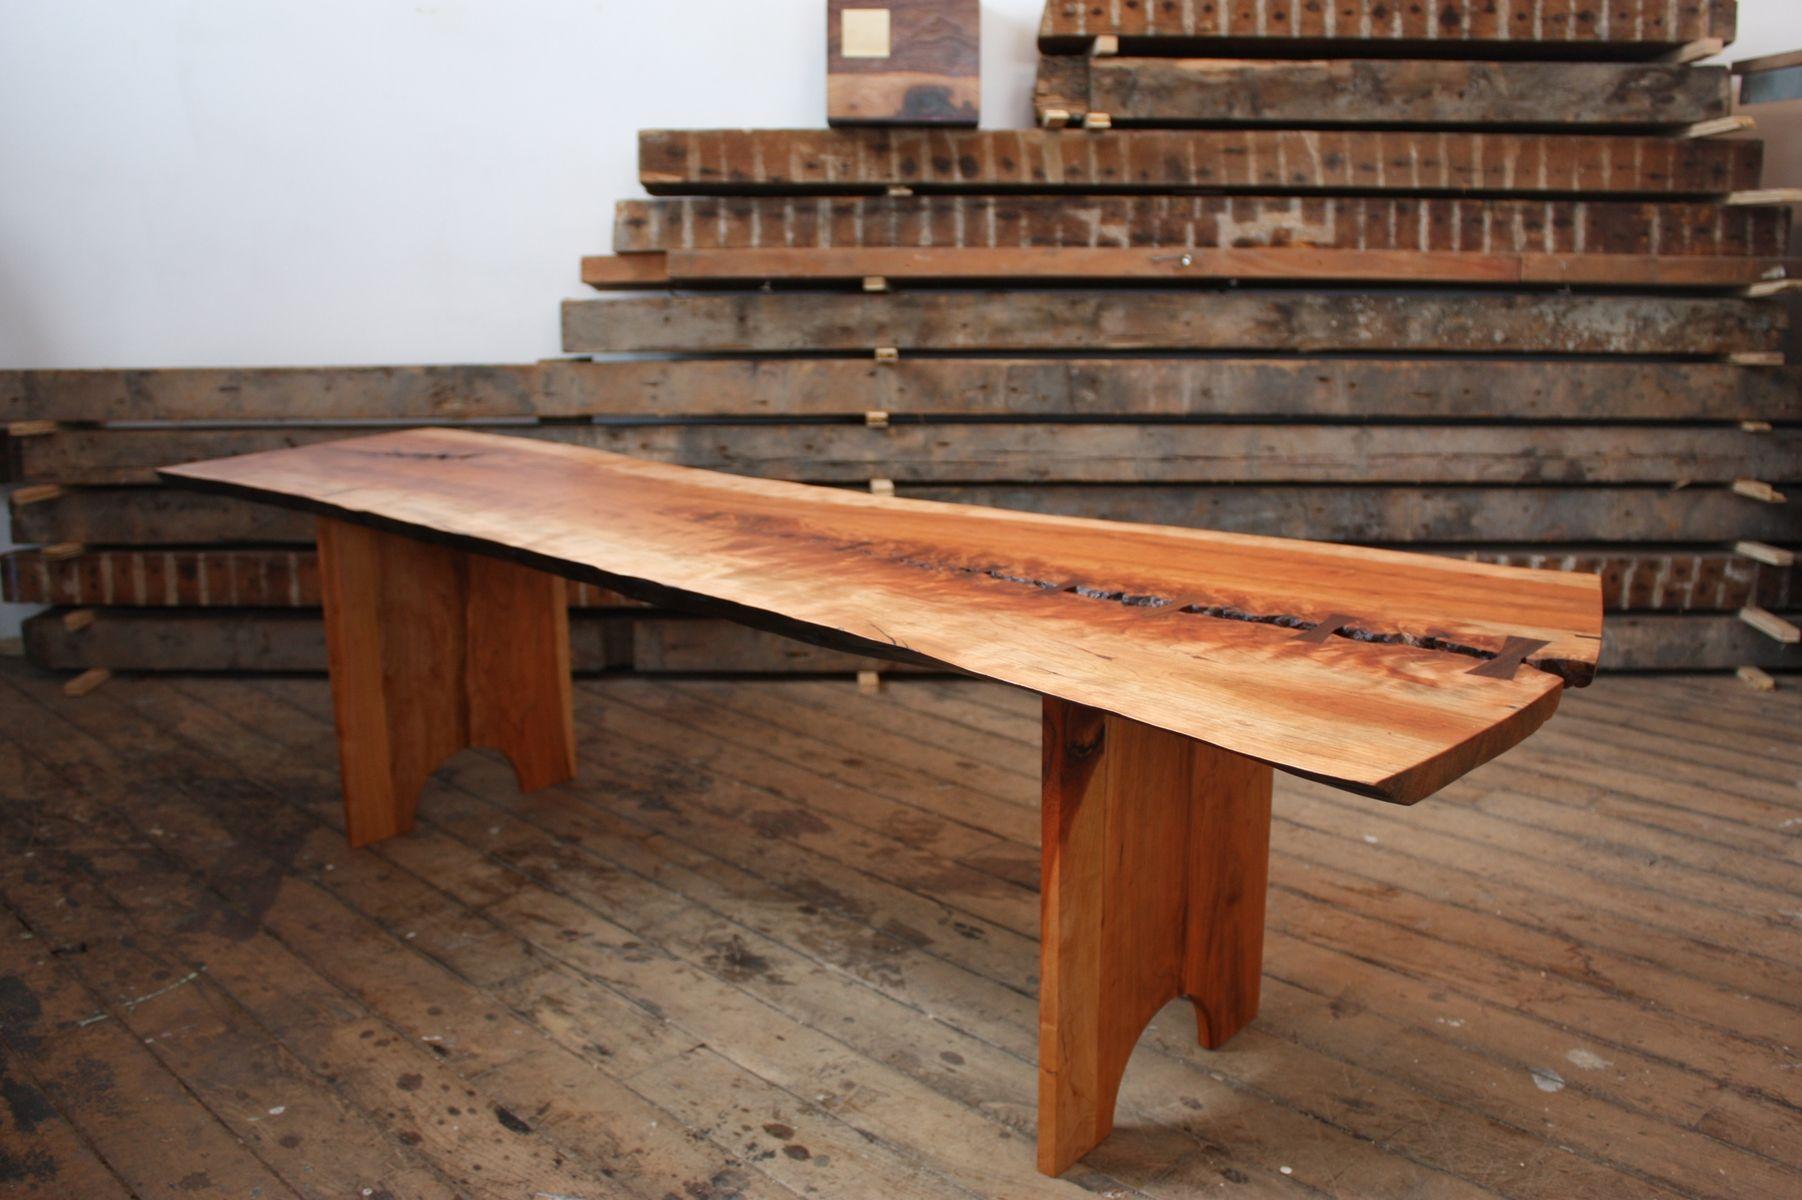 Cherry Slab Bench Wood Bench Design Bench Furniture Live Edge